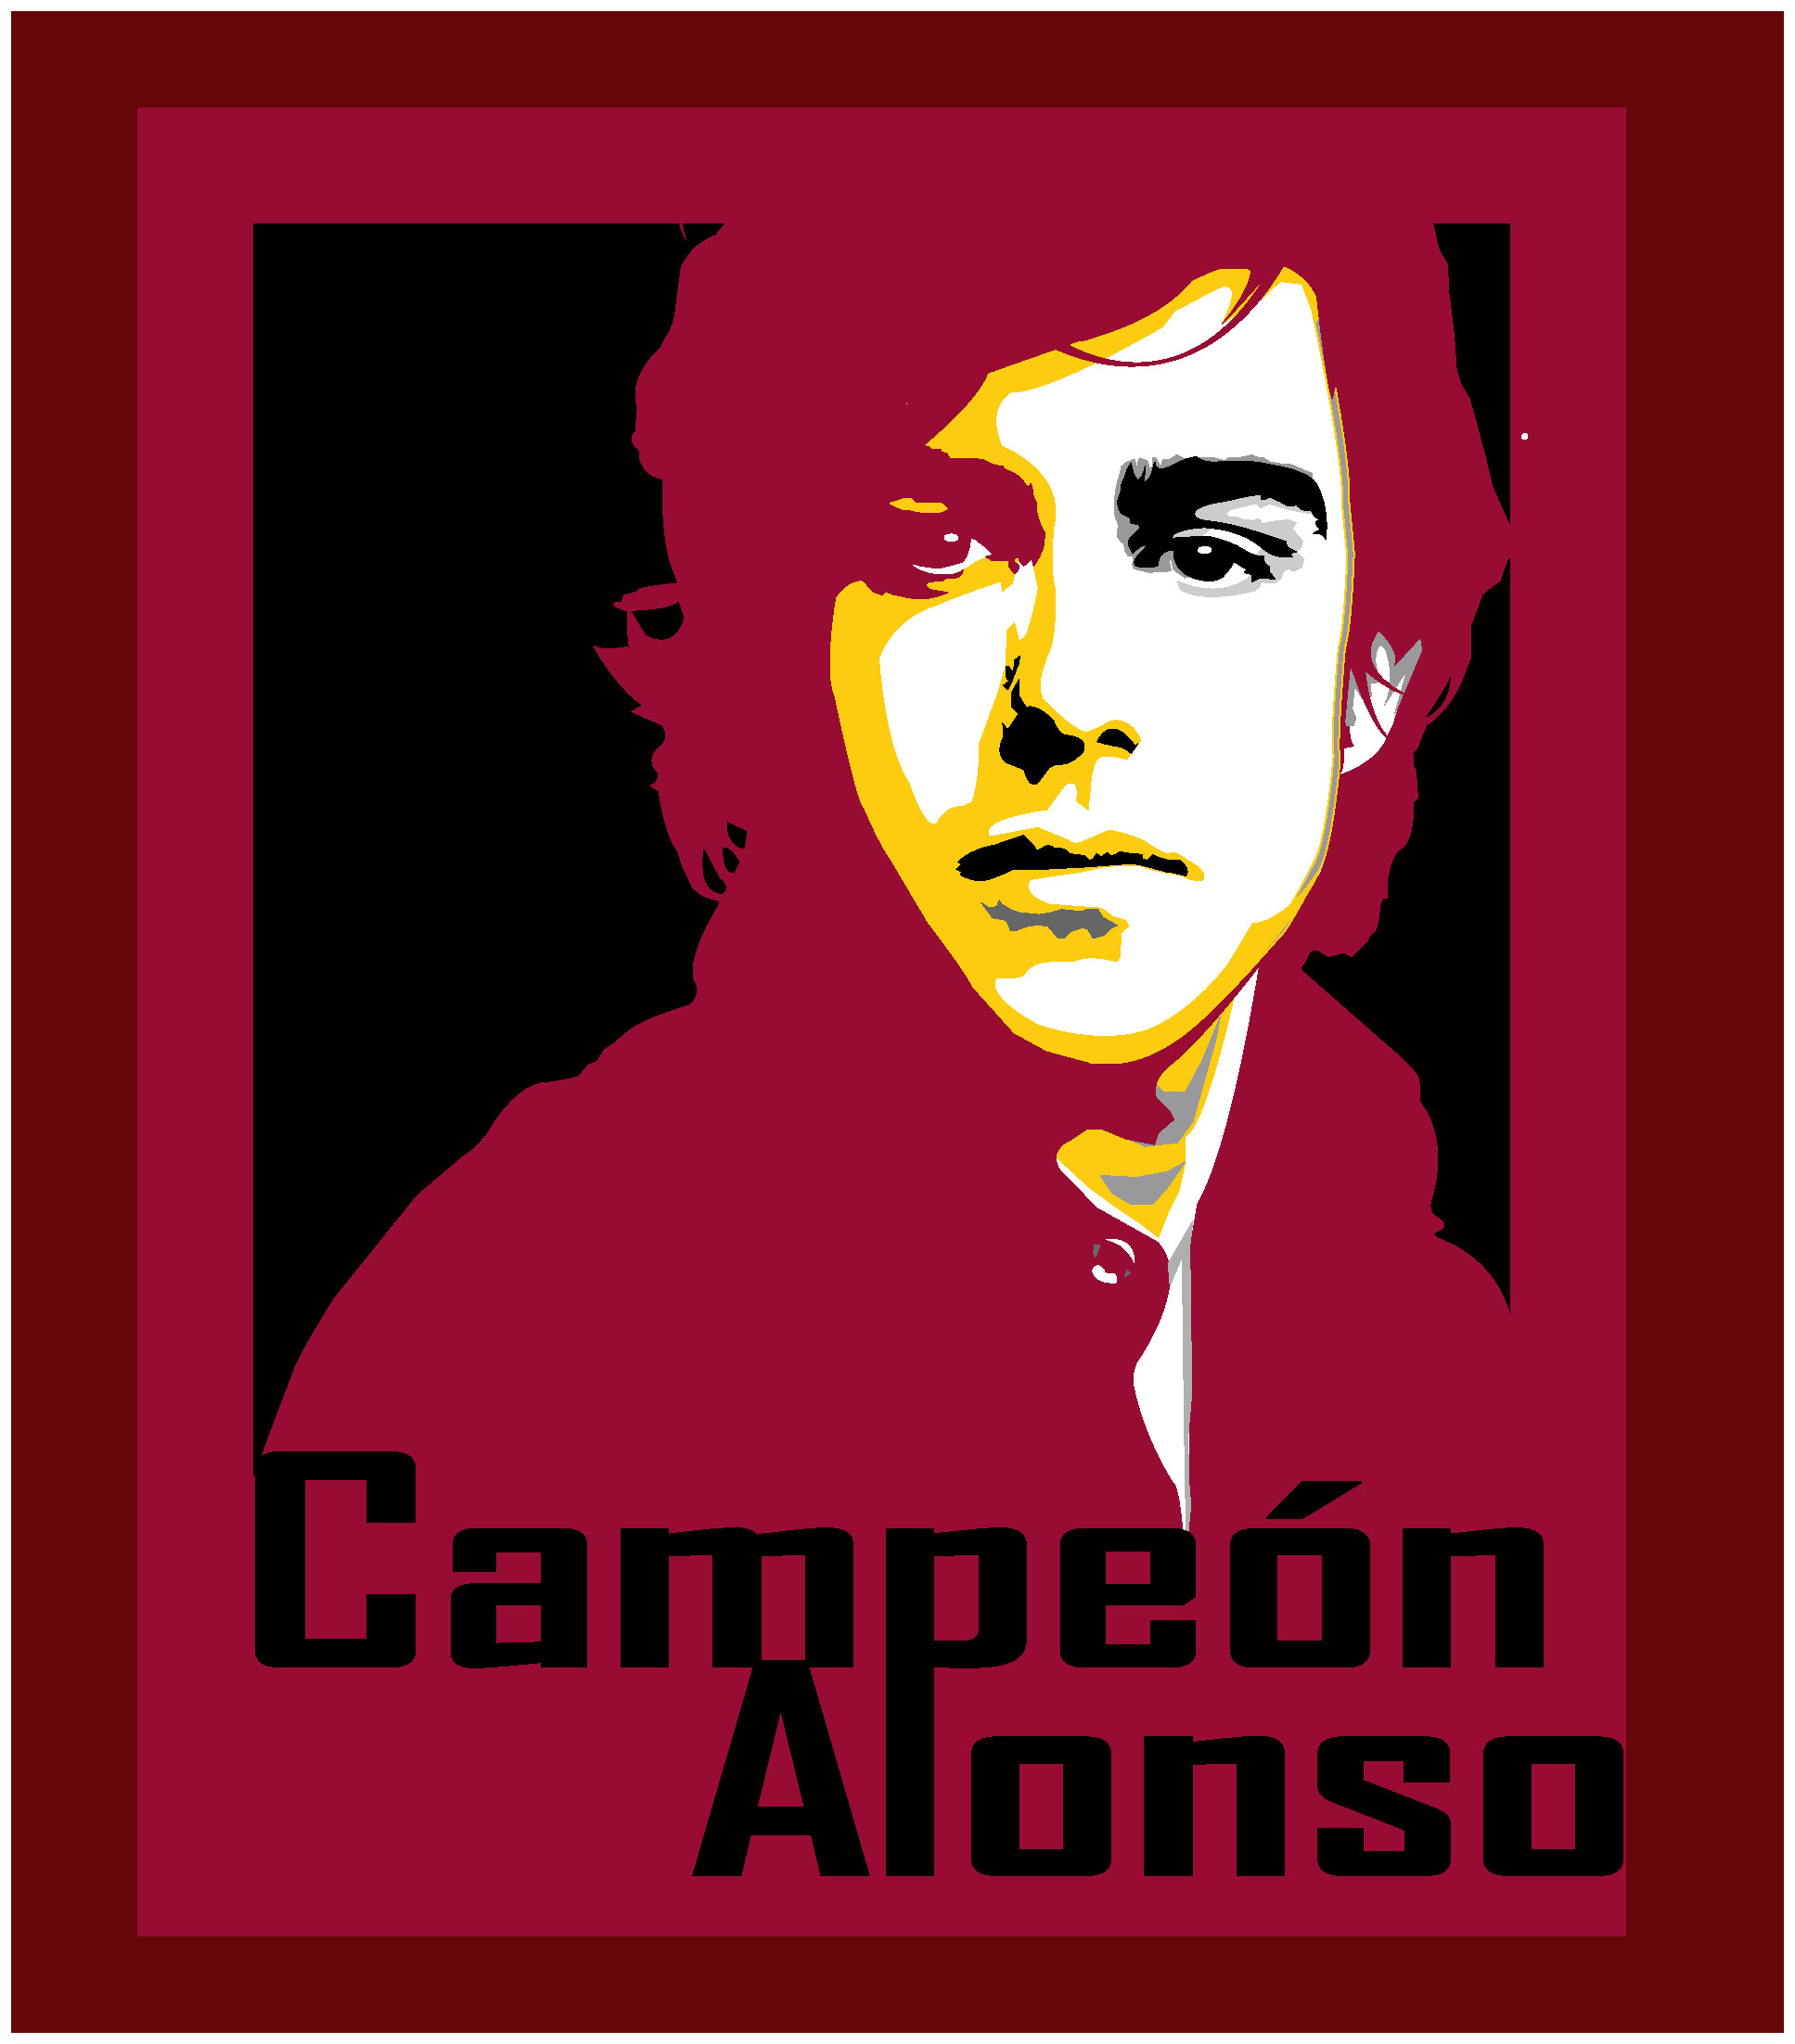 Fernando Alonso by pixelputa